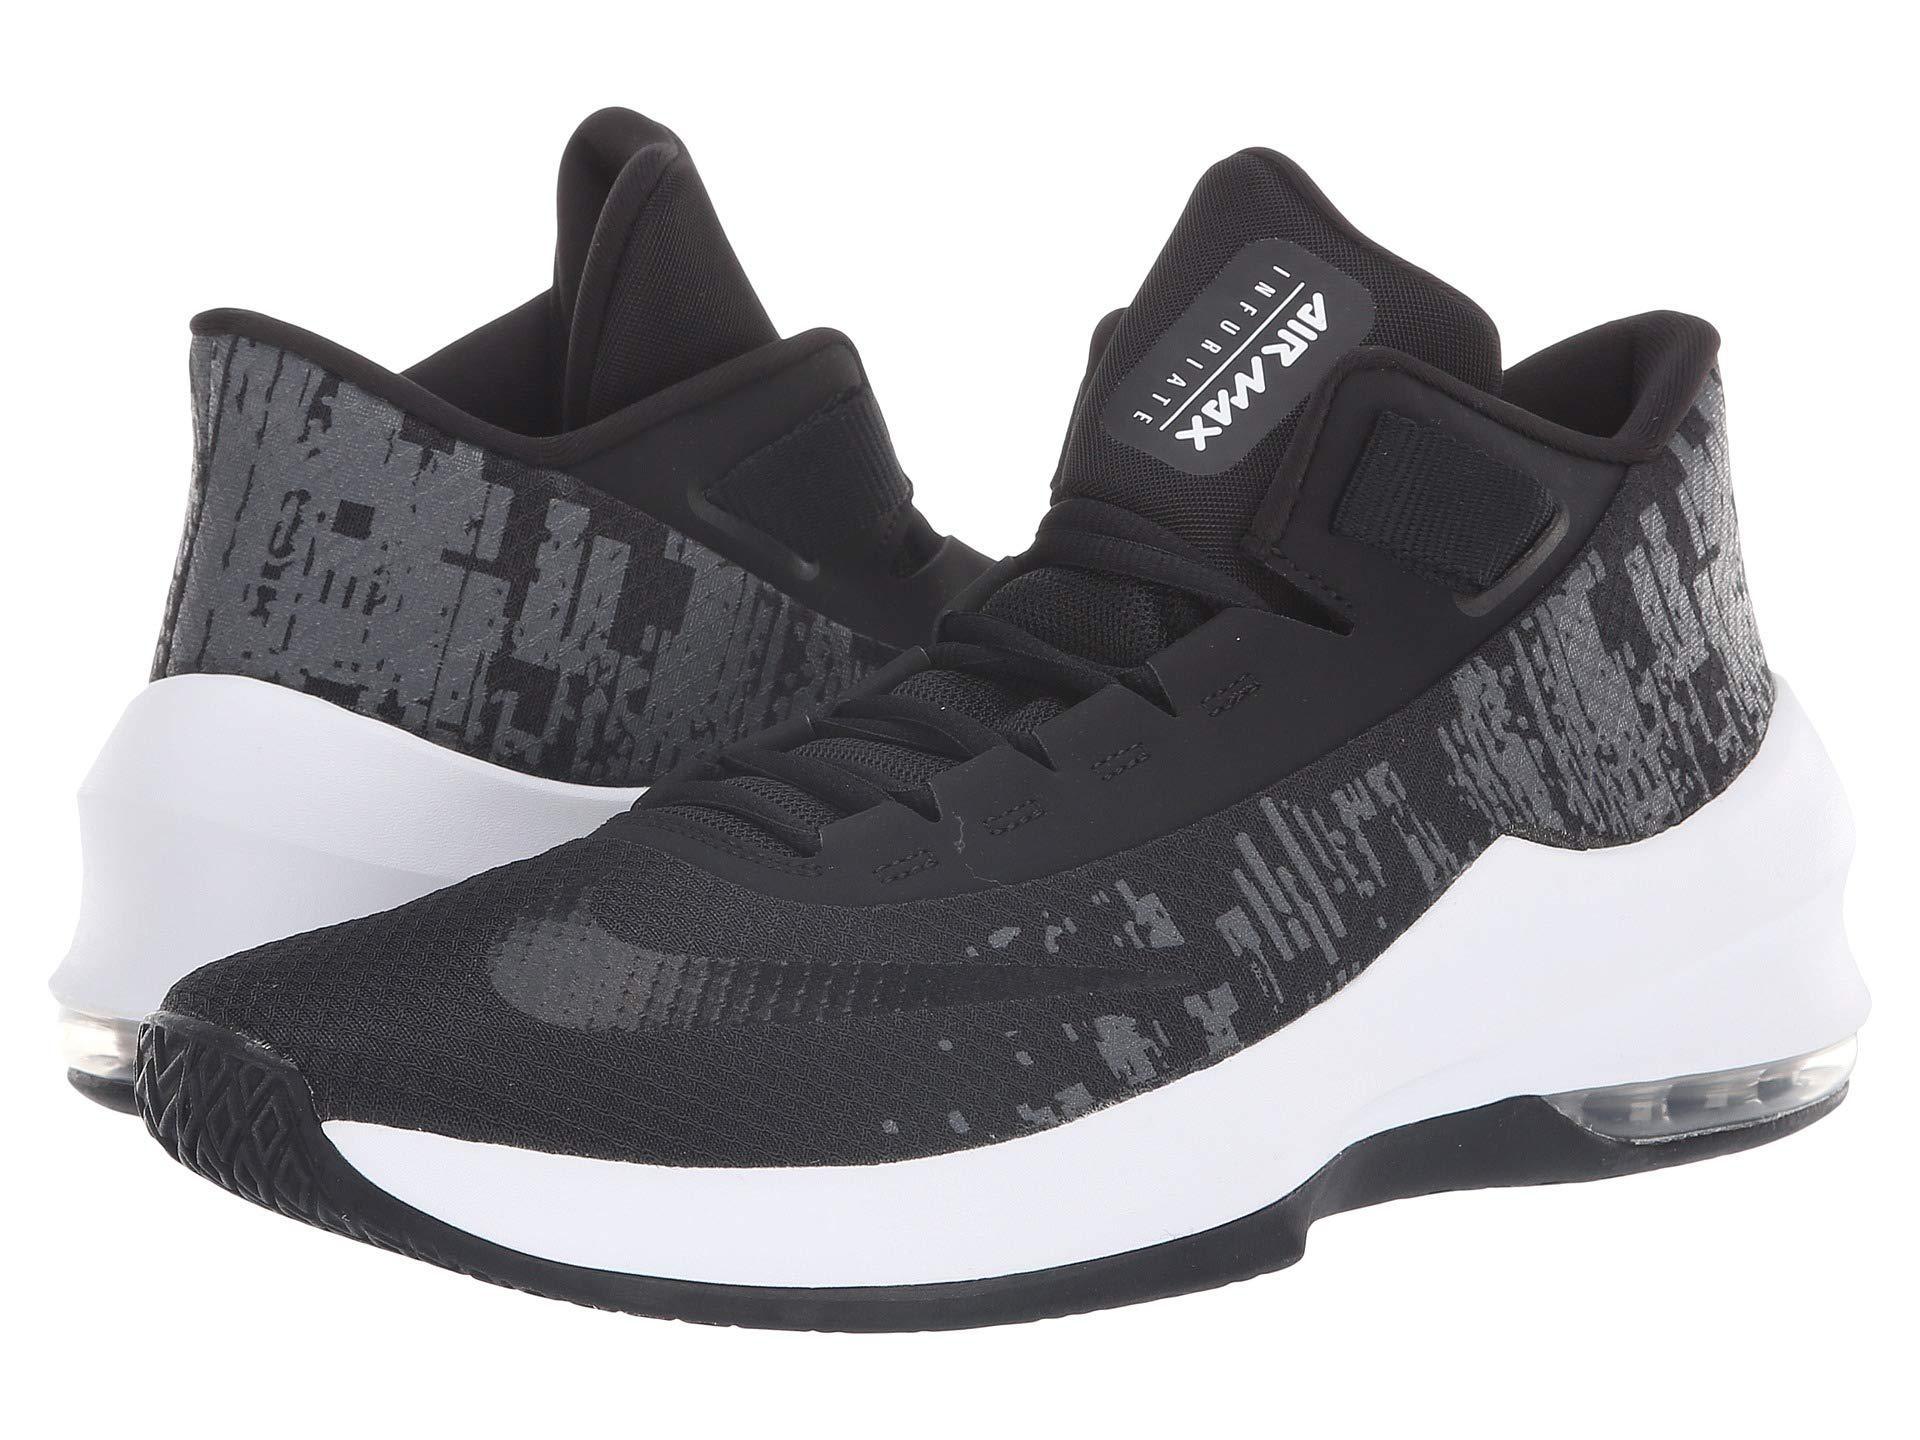 f4cff5a17db6 Nike - Air Max Infuriate 2 Mid (black university Red anthracite) Men s.  View fullscreen